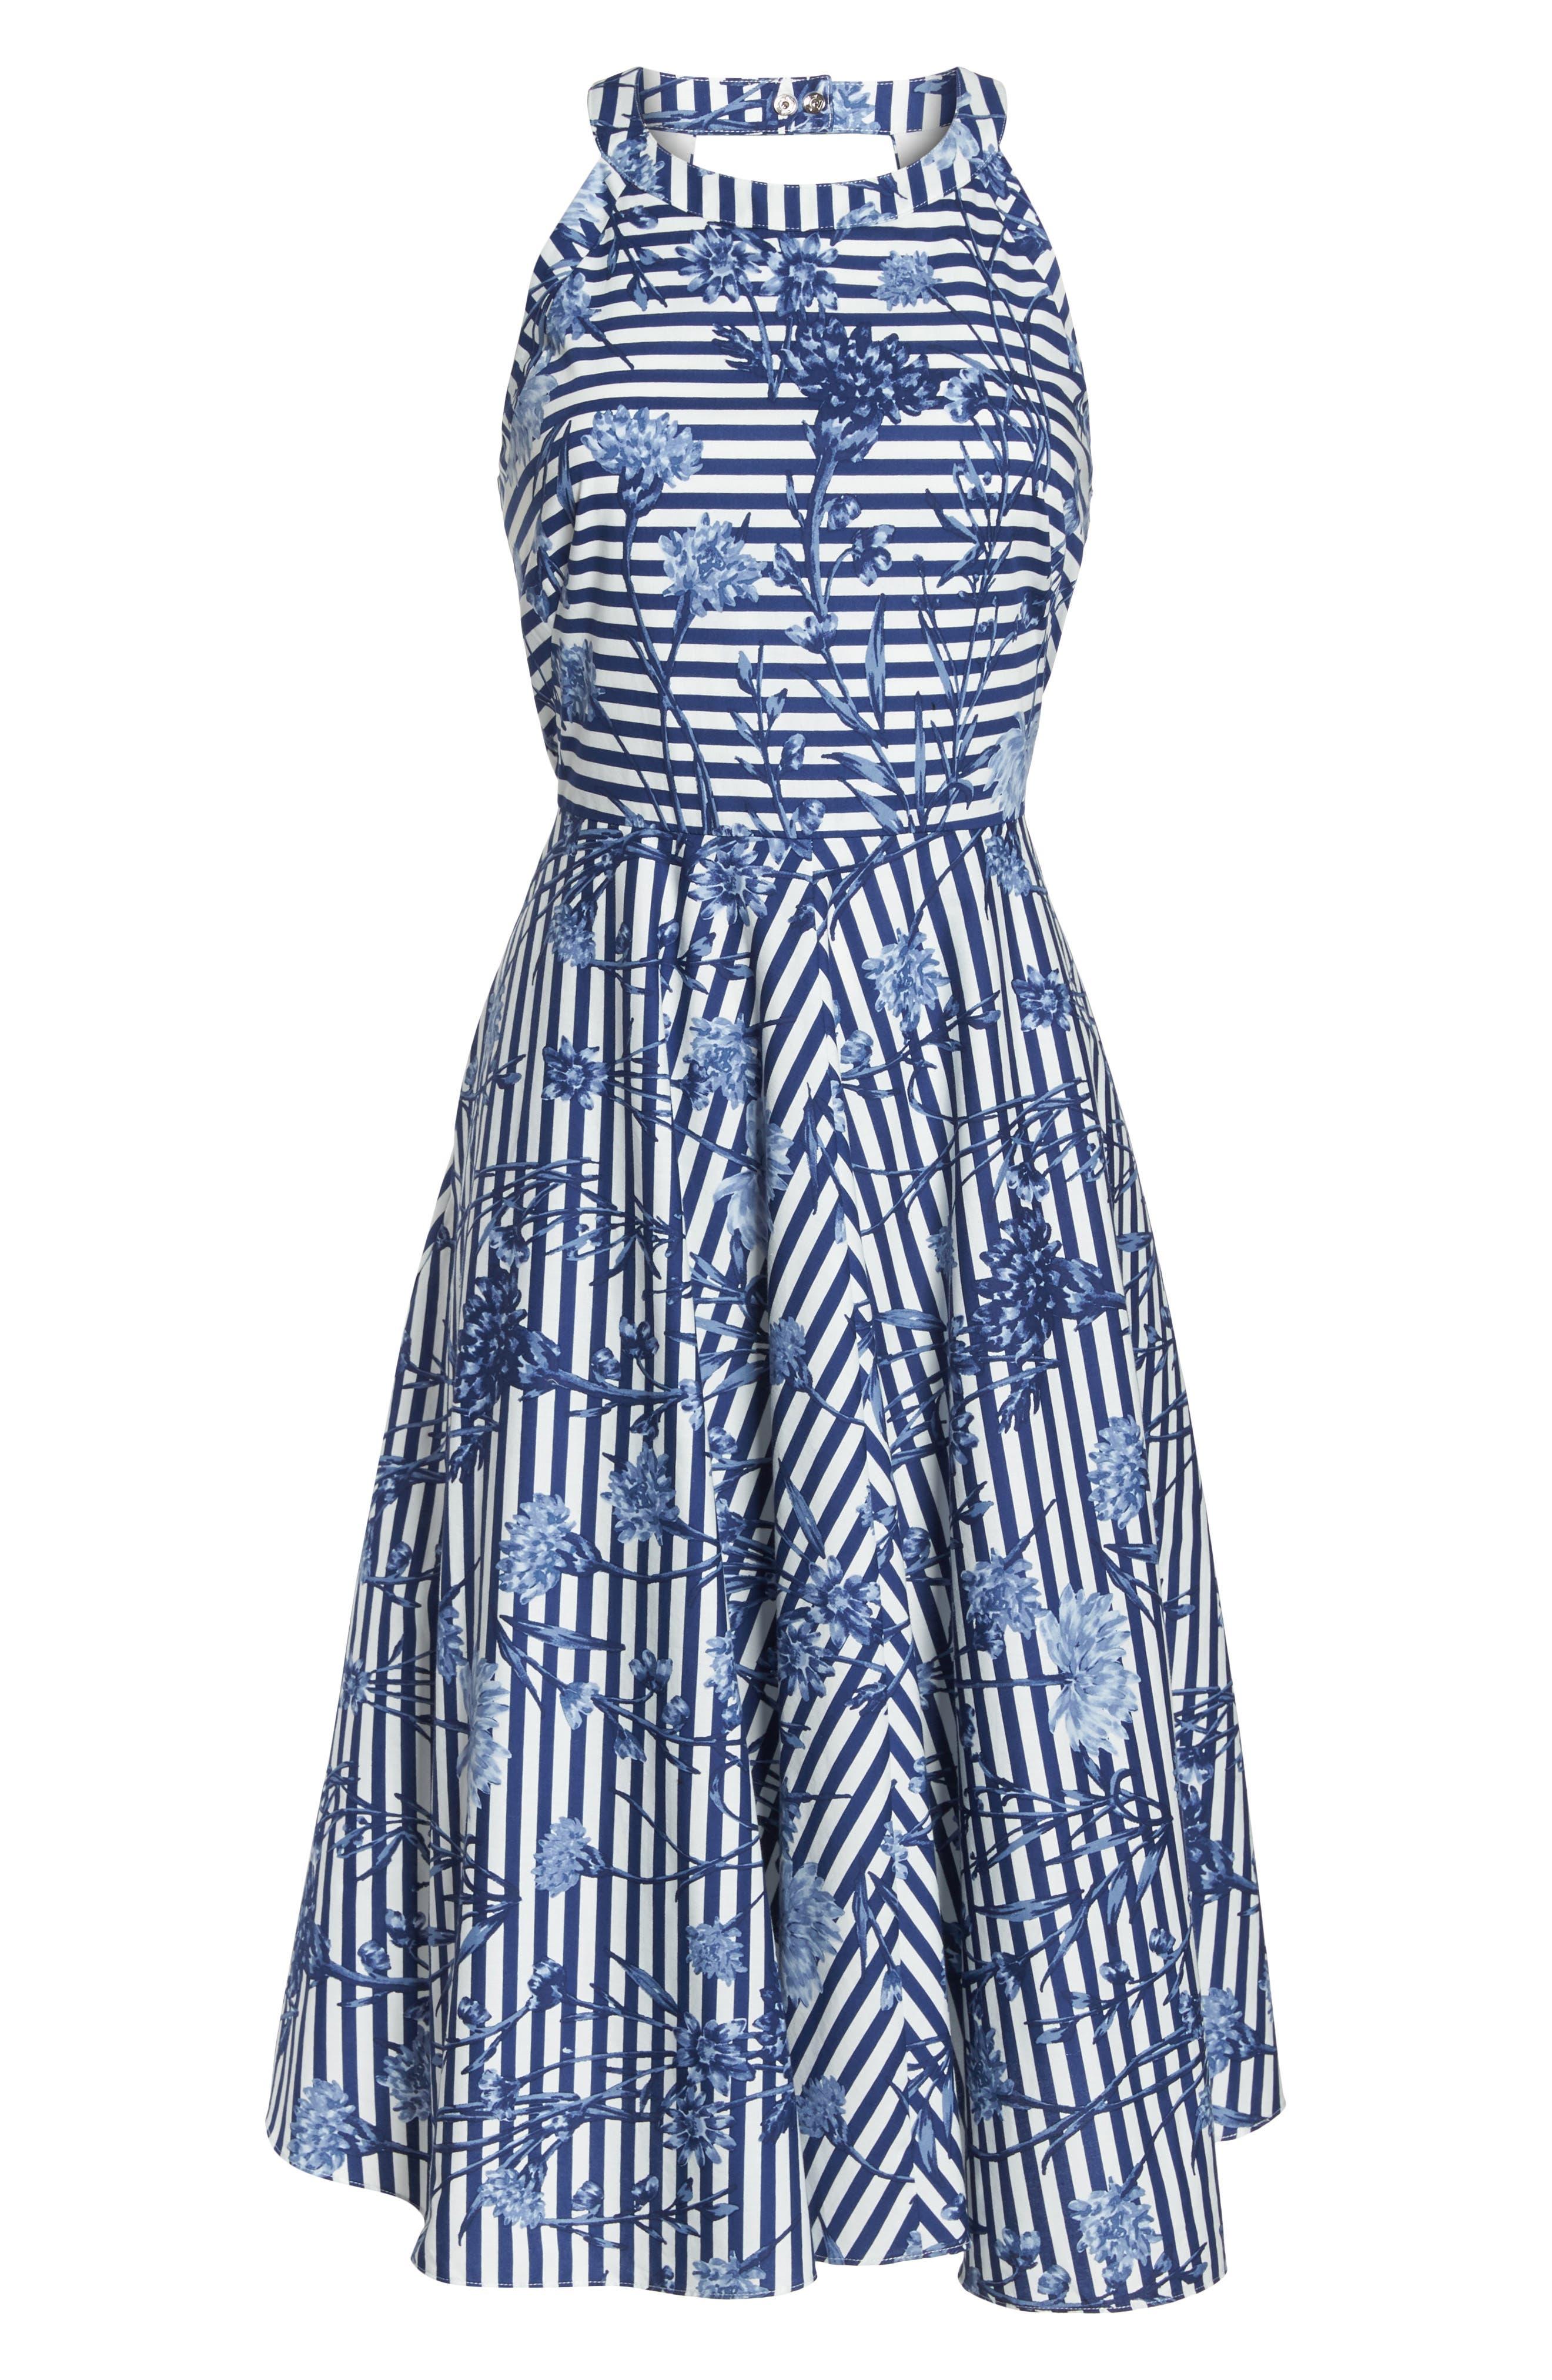 Floral Stripe Halter Fit & Flare Poplin Dress,                             Alternate thumbnail 7, color,                             Blue/ White